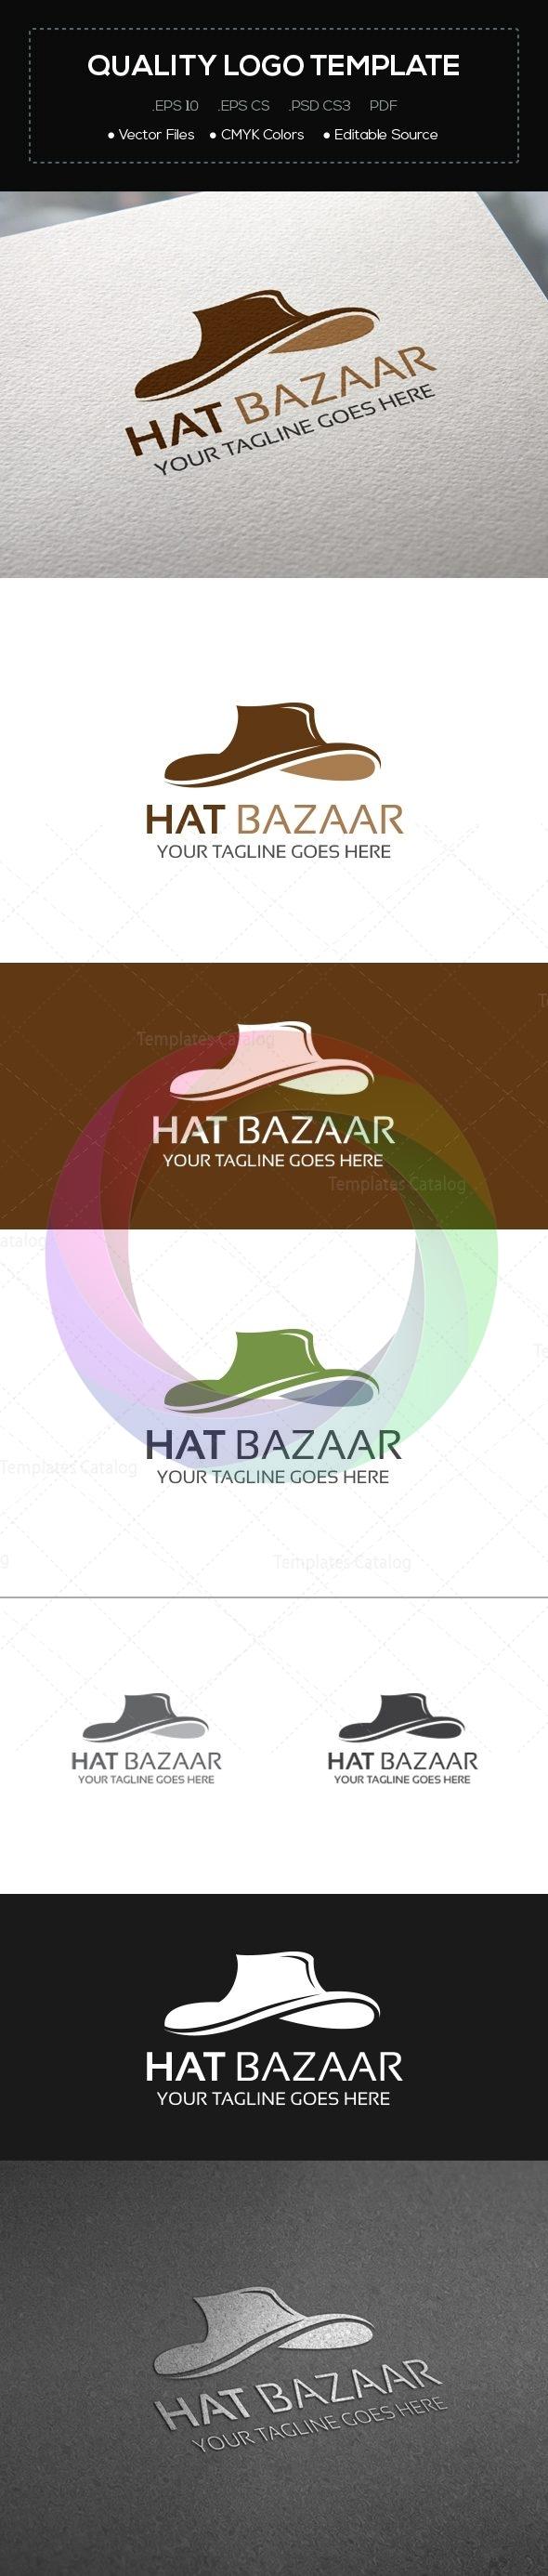 Hat-Bazaar-Logo-Template-1.jpg